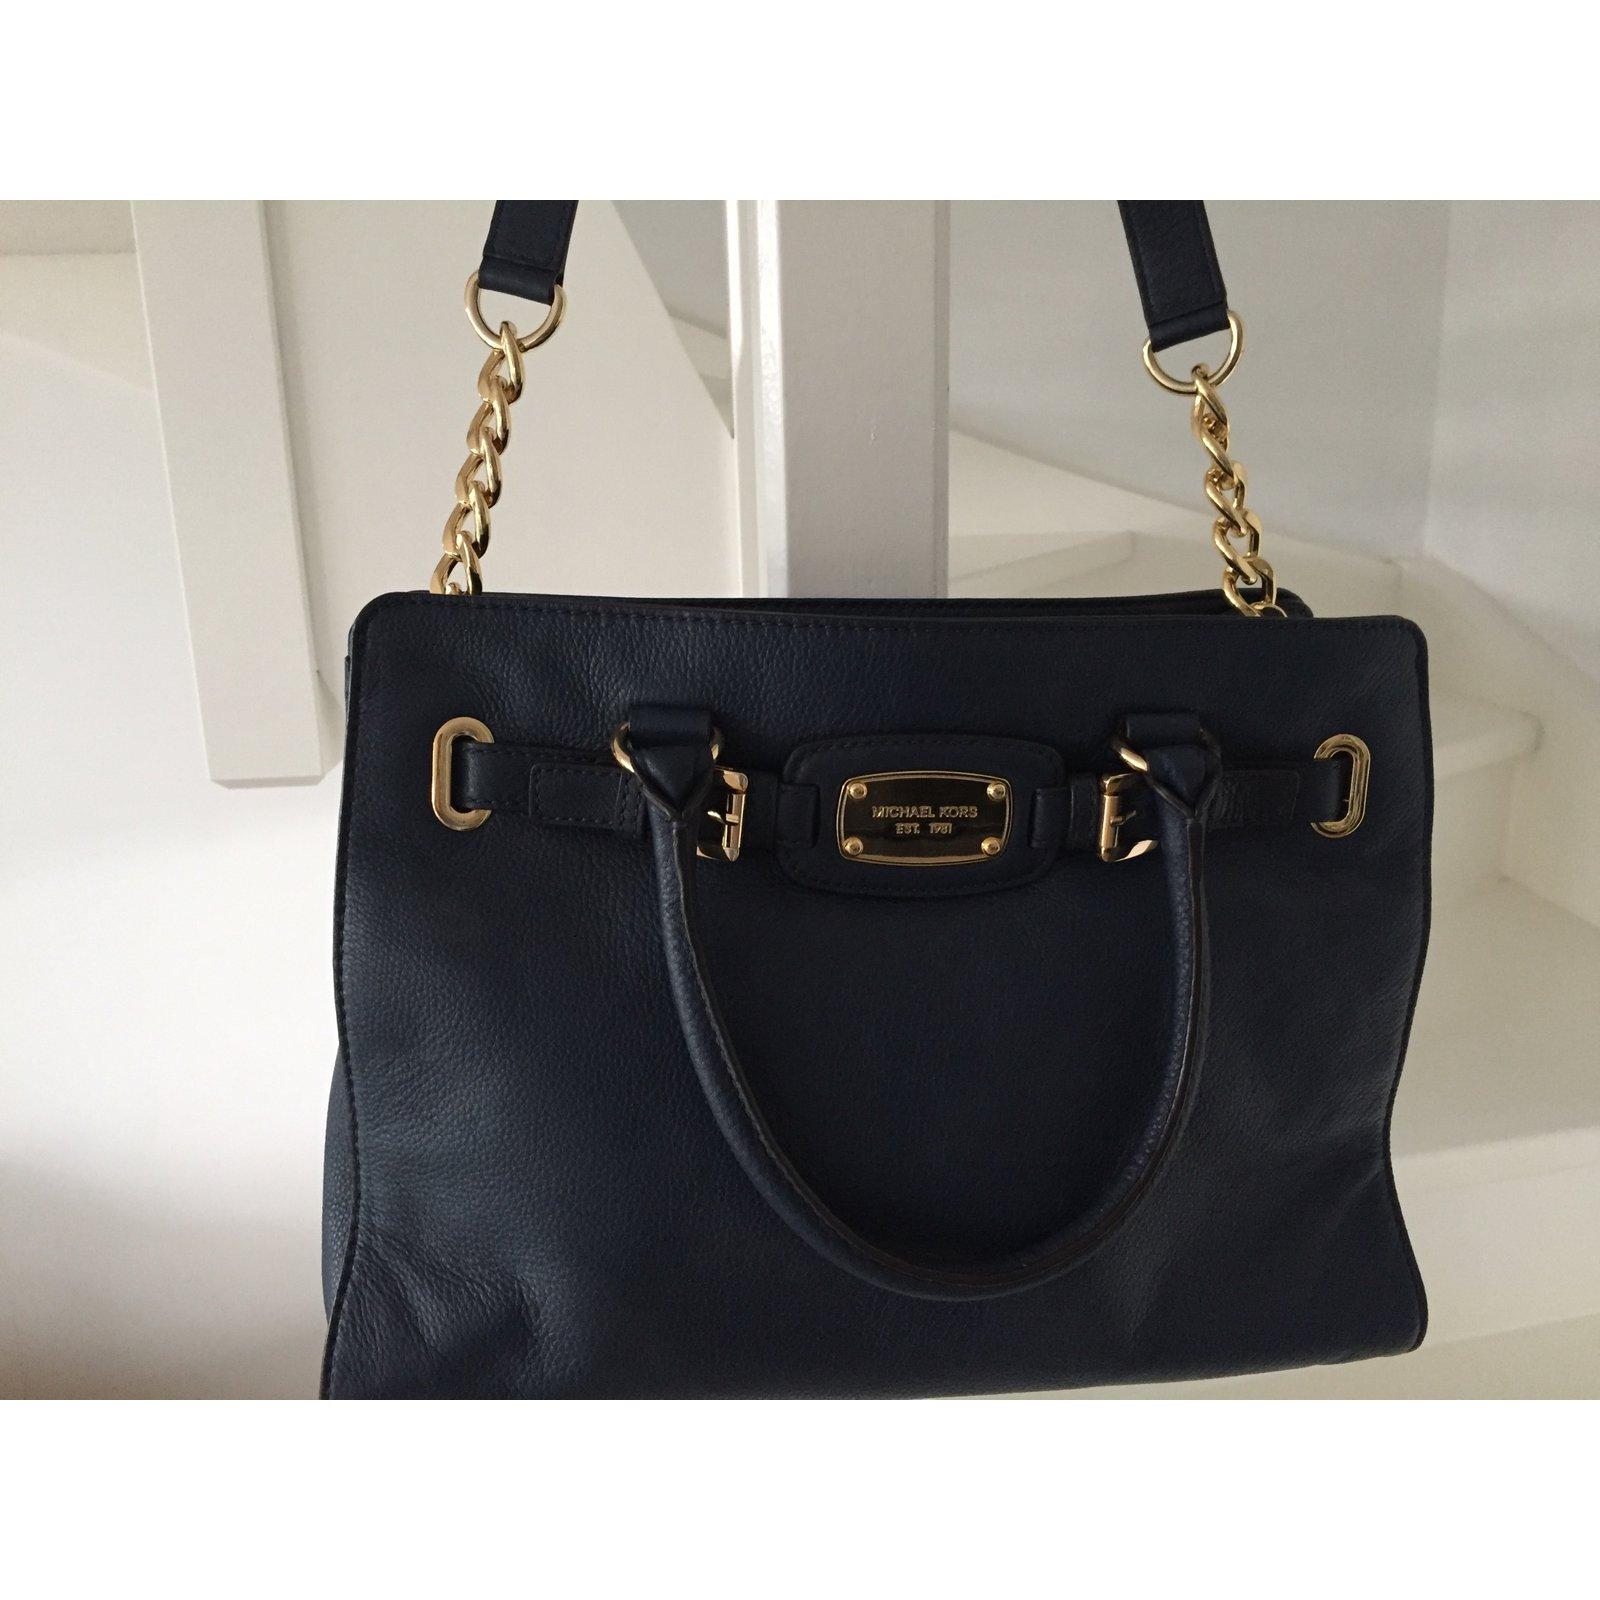 8df0f37b5b535b Michael Kors Handbags Handbags Leather Navy blue ref.45299 - Joli Closet